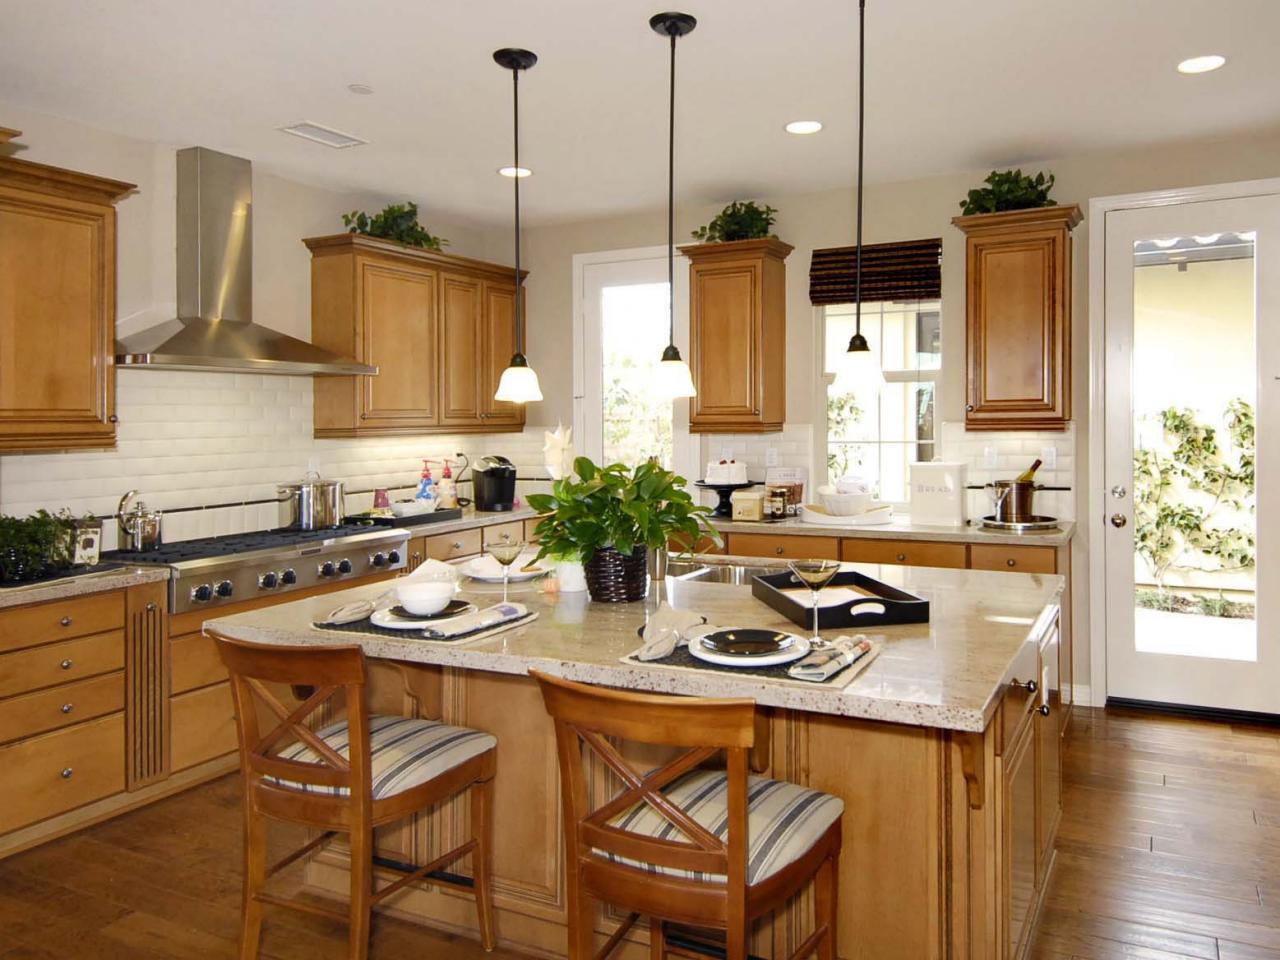 kitchen countertop ideas cheap kitchen countertops: pictures, options u0026 ideas   hgtv ESOOLVZ